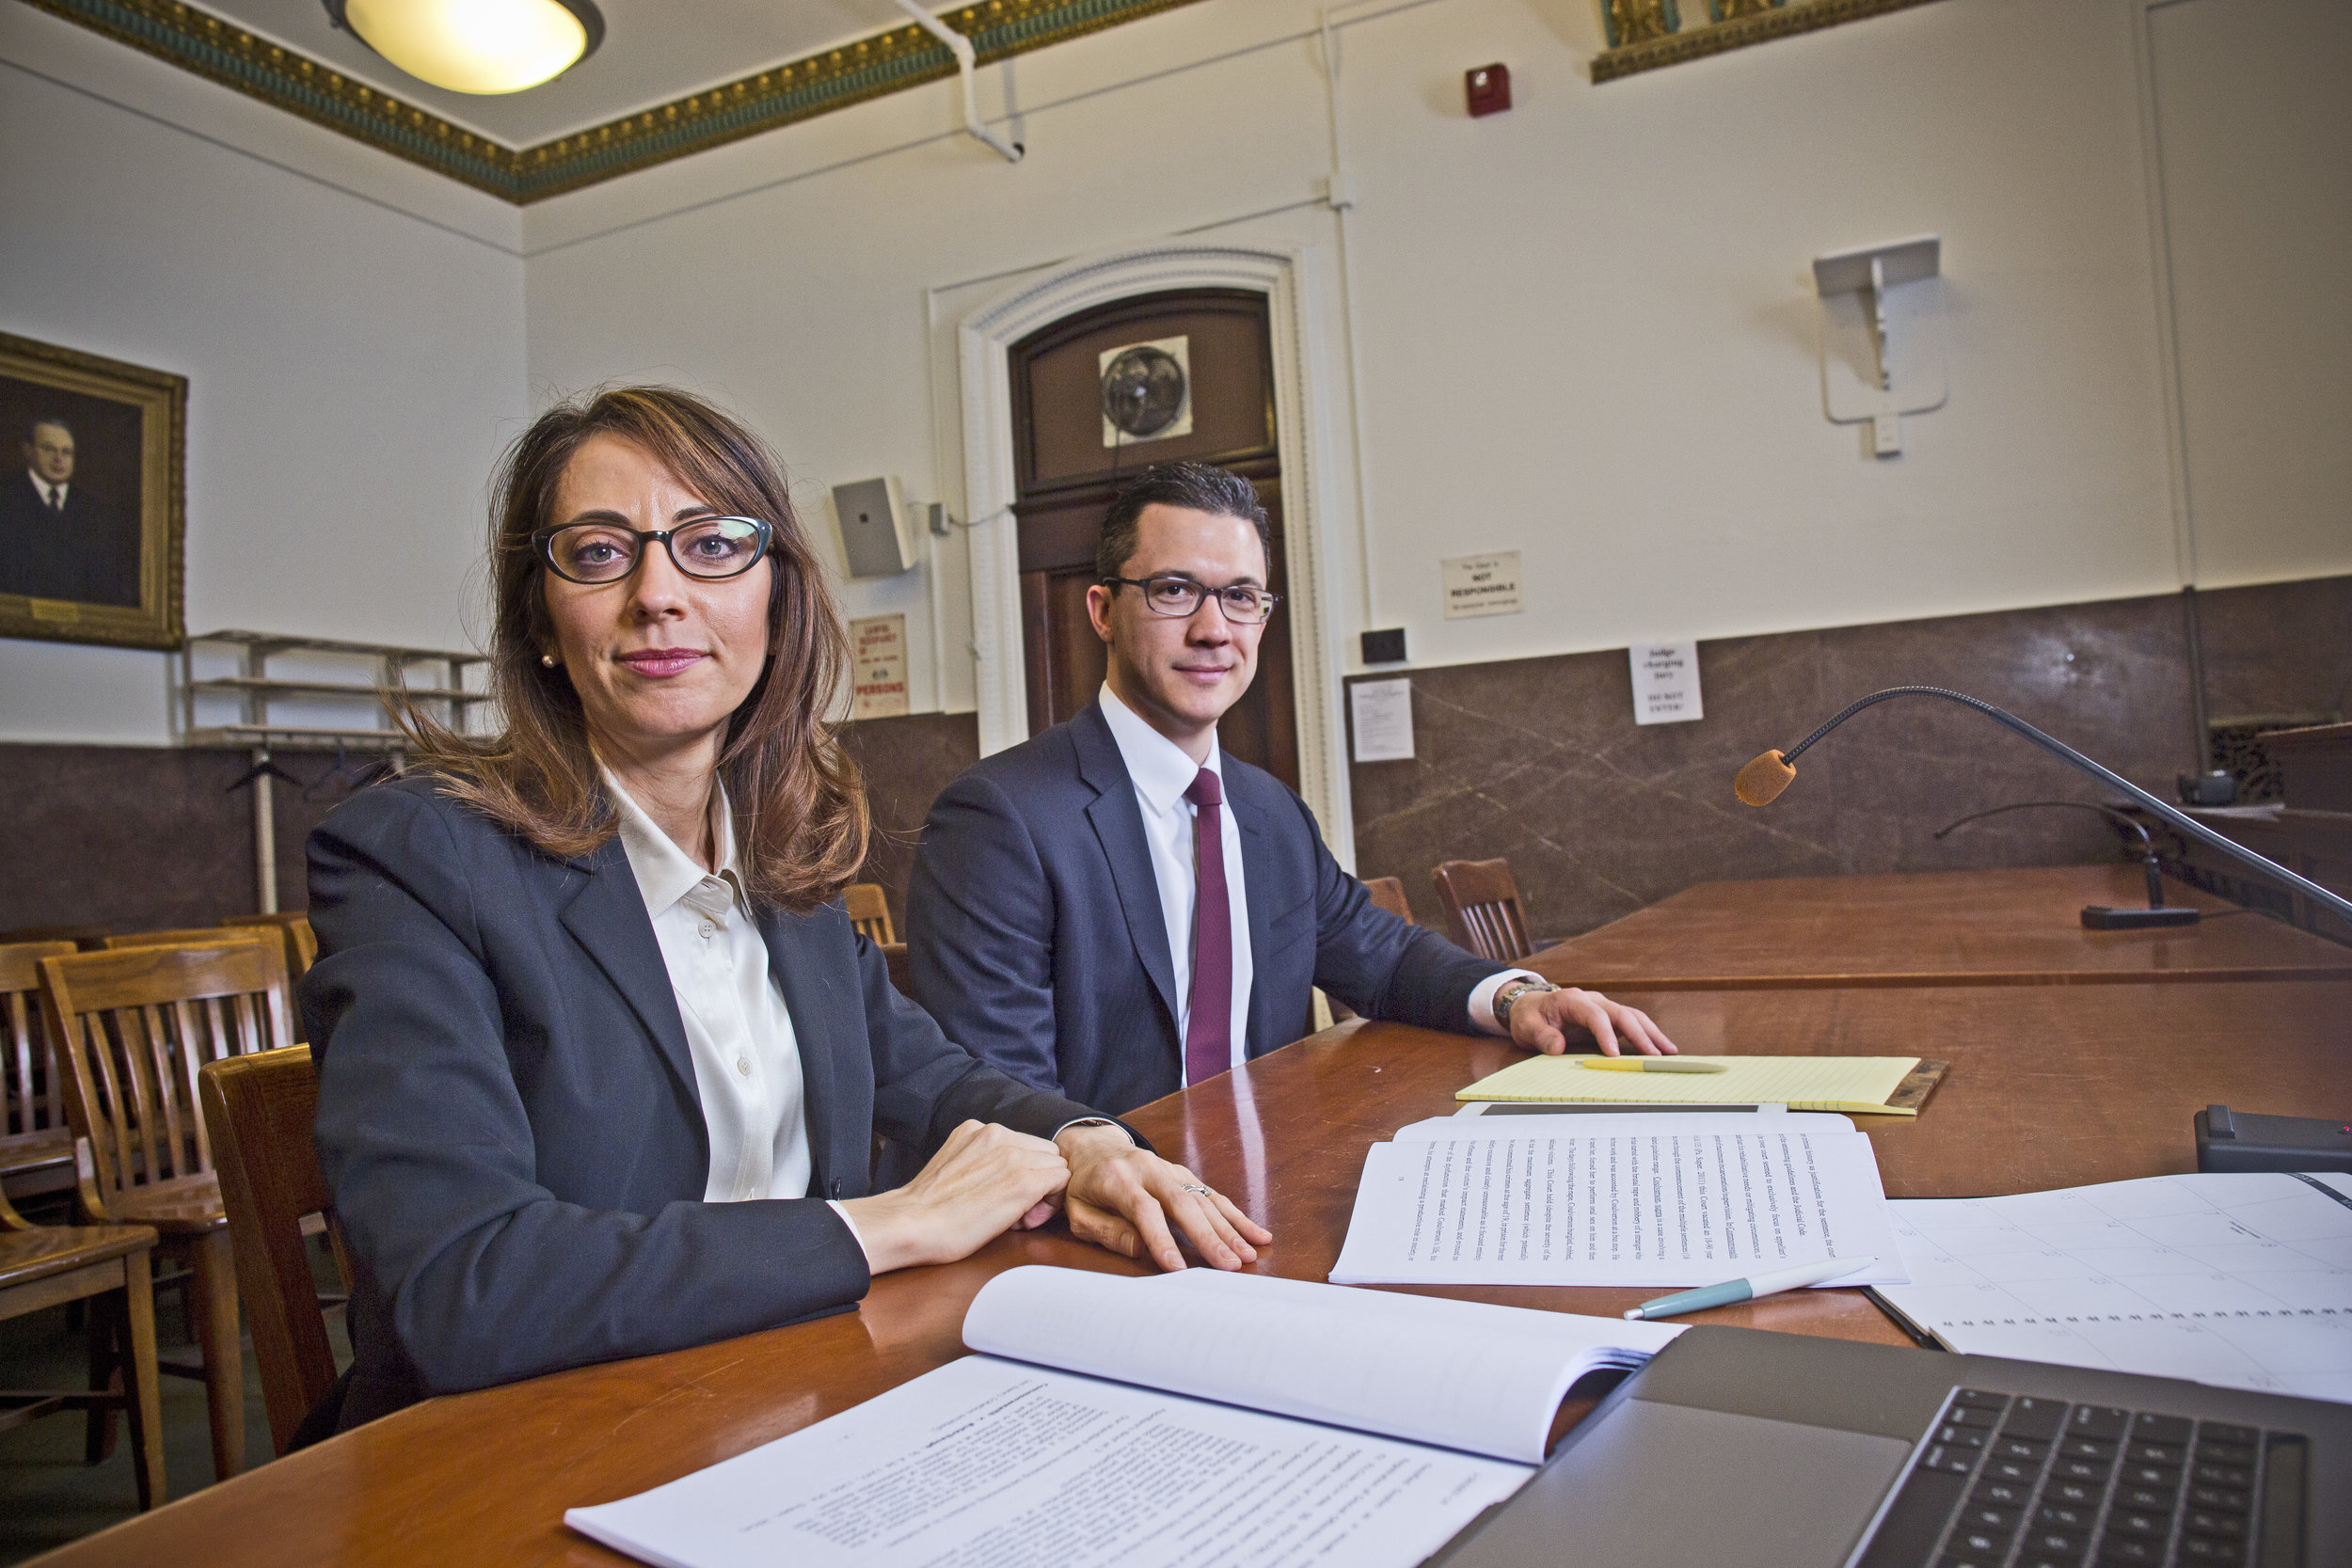 Philadelphia Criminal Defense Lawyers Zak Goldstein